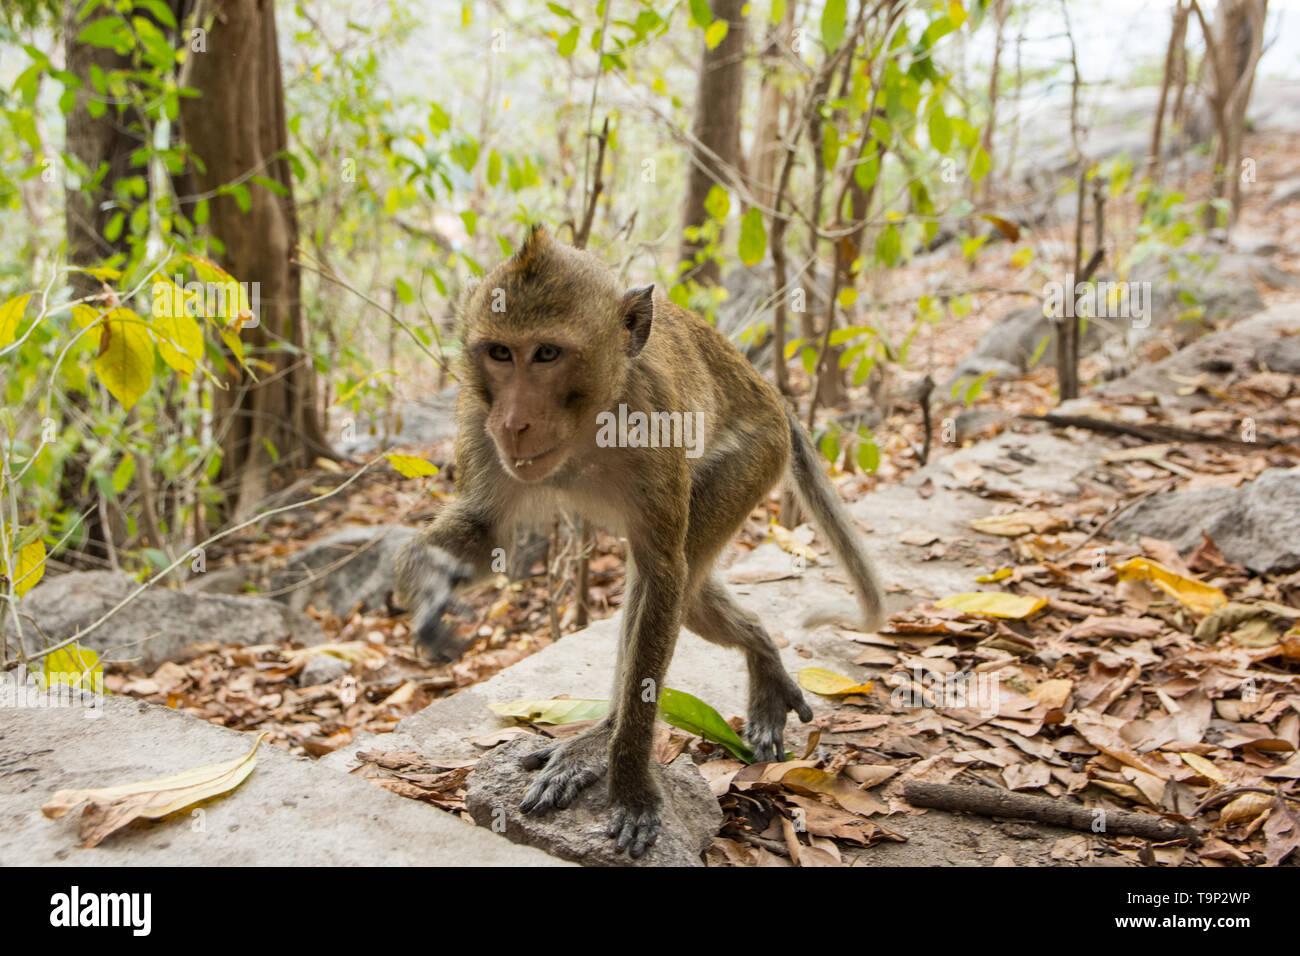 Monkey in the wild - Stock Image